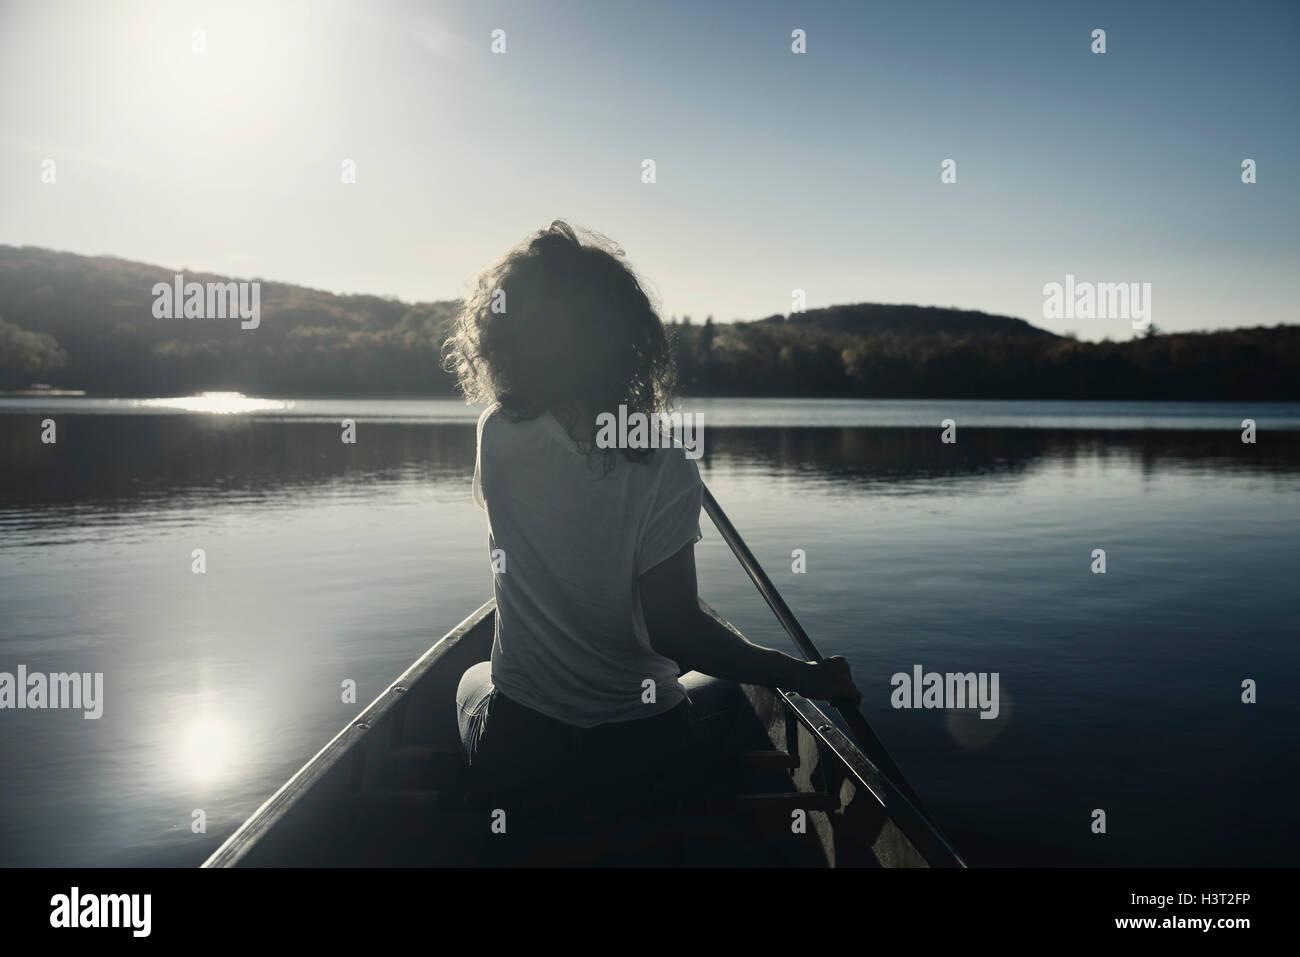 Young woman canoeing on a lake in fall. Muskoka, Ontario, Canada. - Stock Image